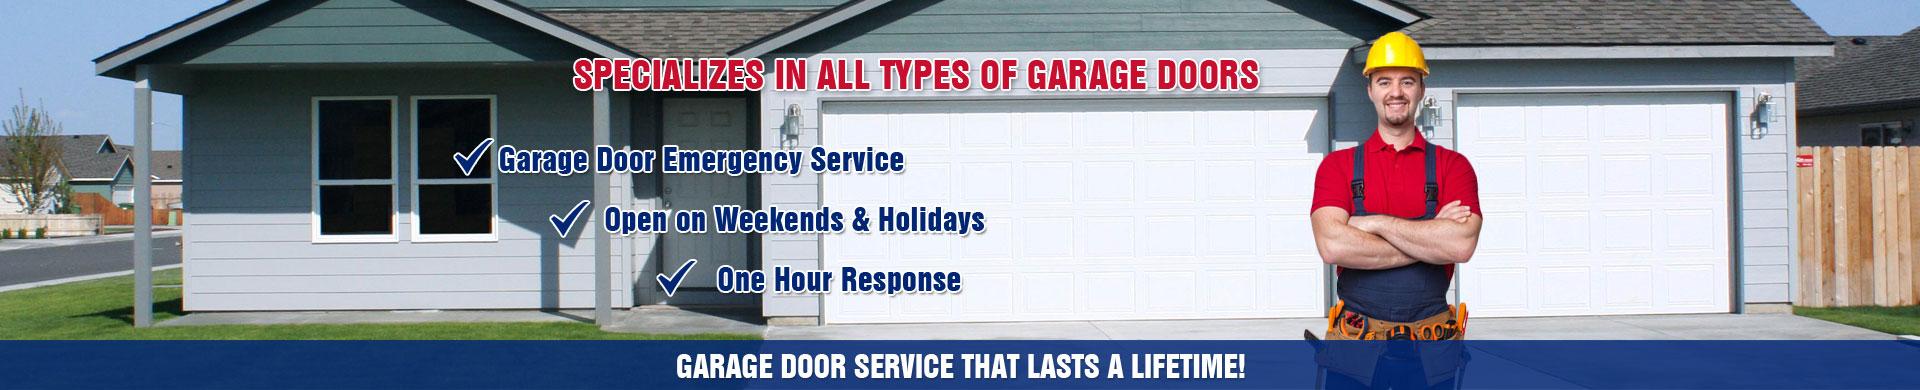 24 / 7 Emergency Service